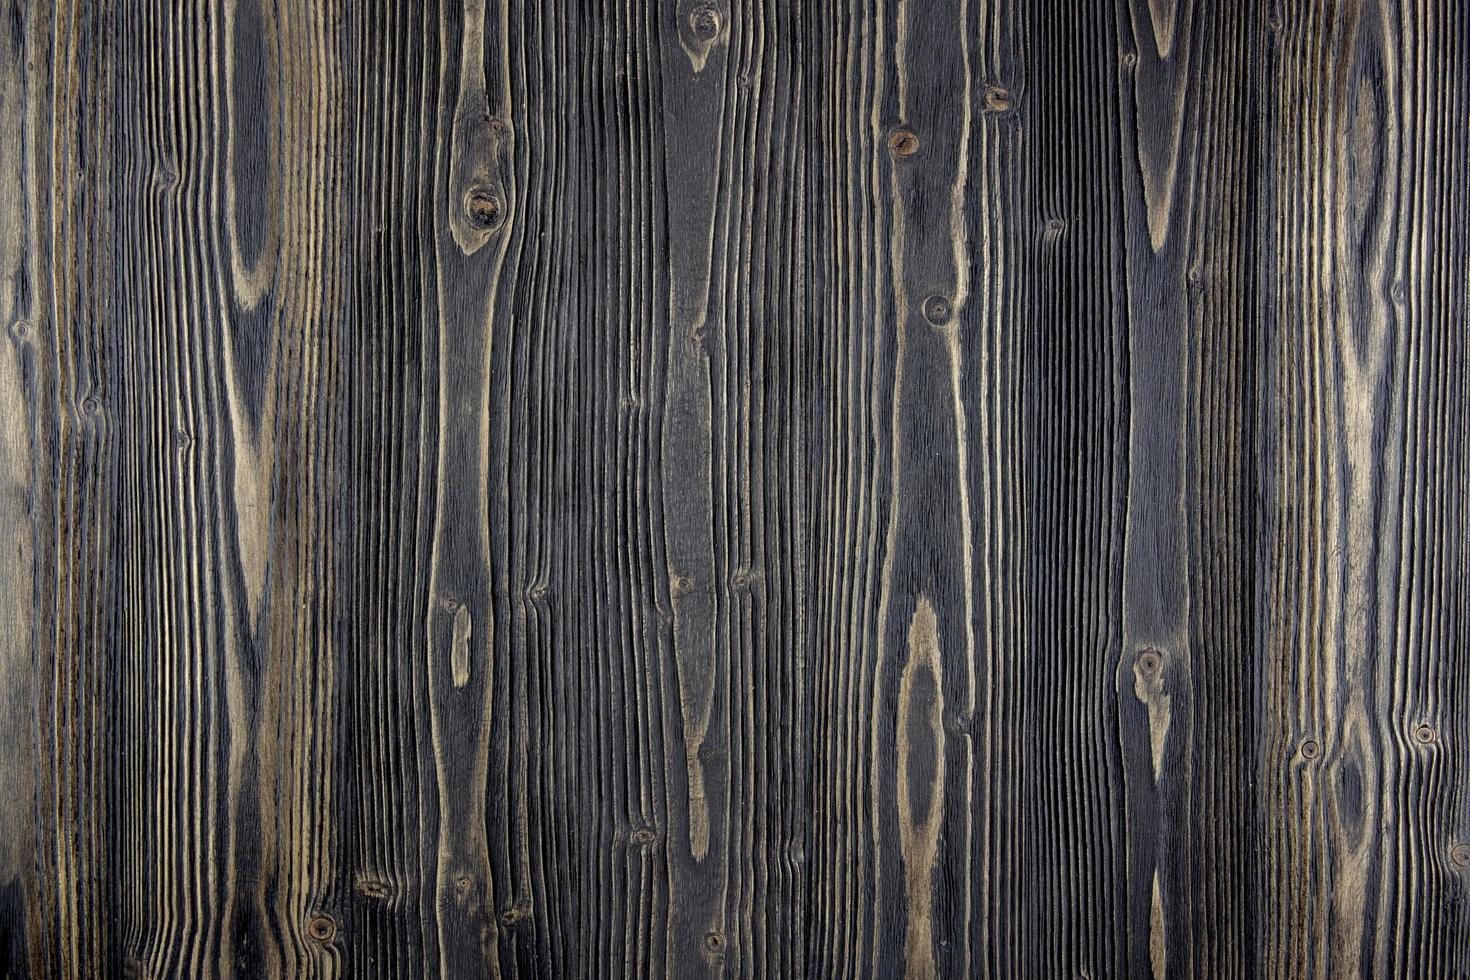 dunkle Holztischoberfläche foto